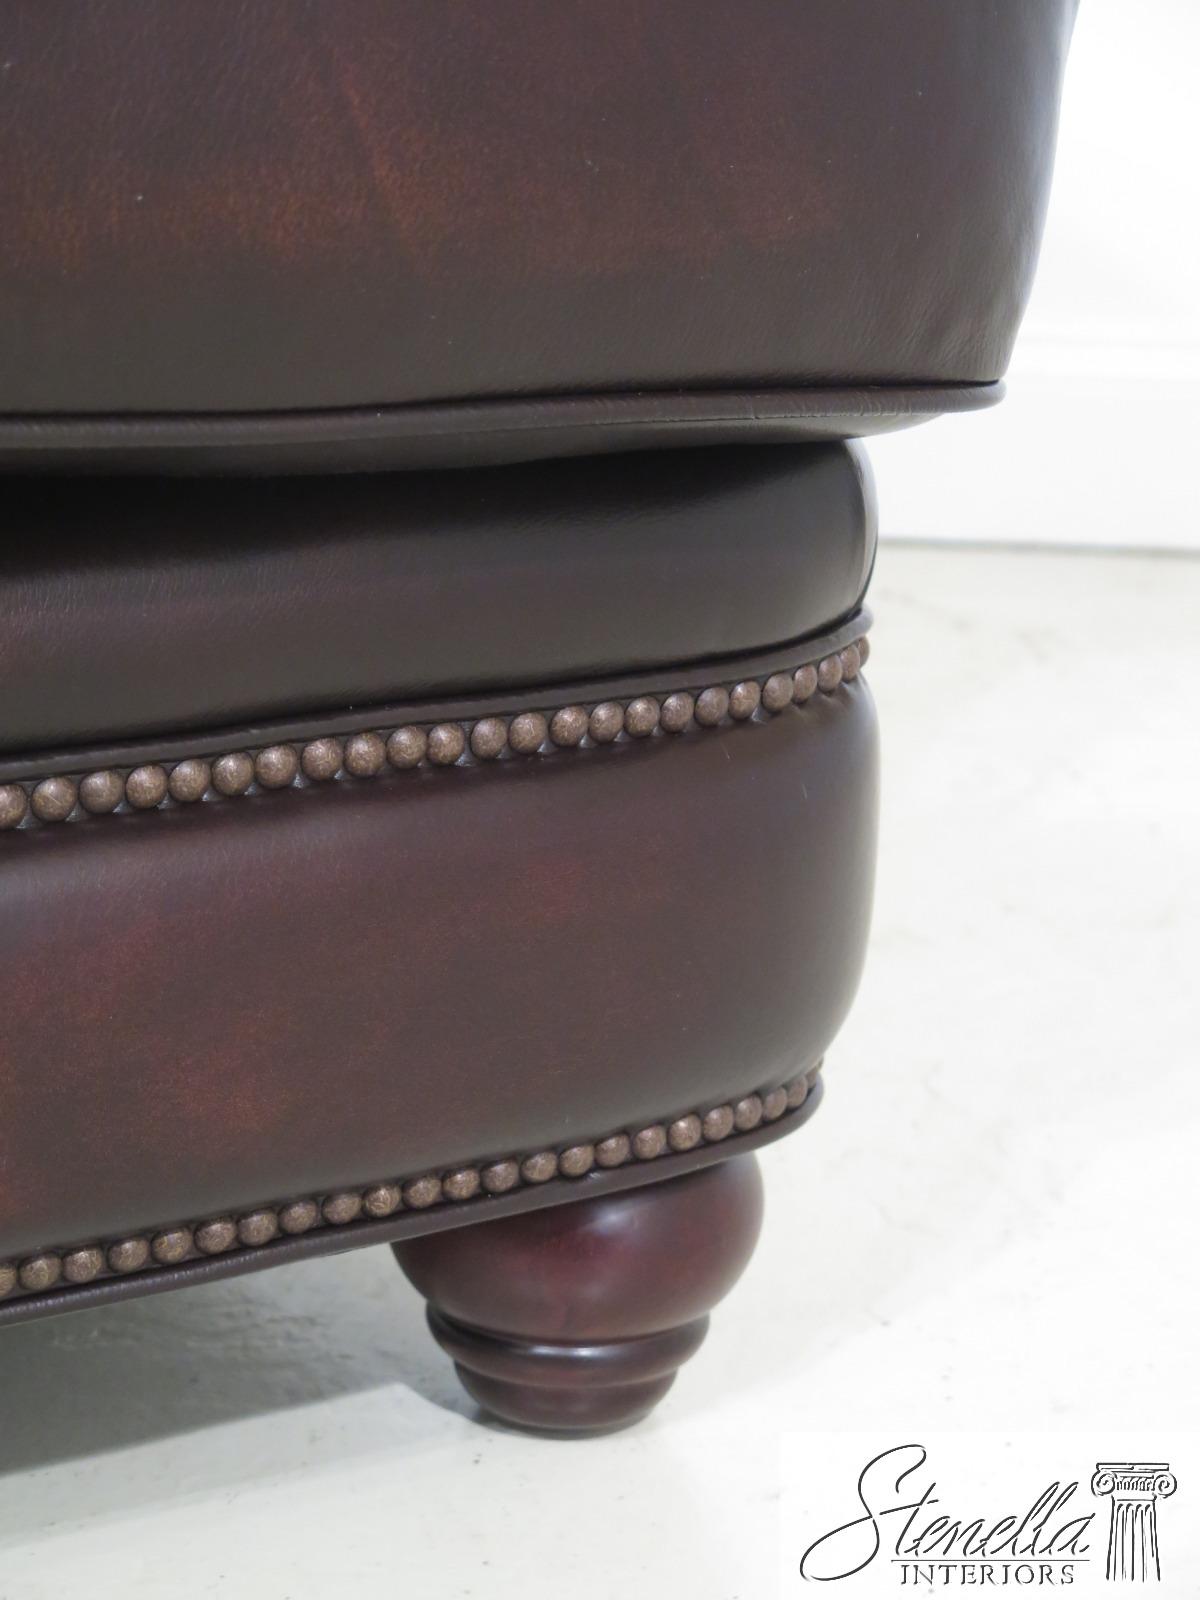 49383: MAITLAND SMITH RA324 Brown Leather Tufted Back Sofa